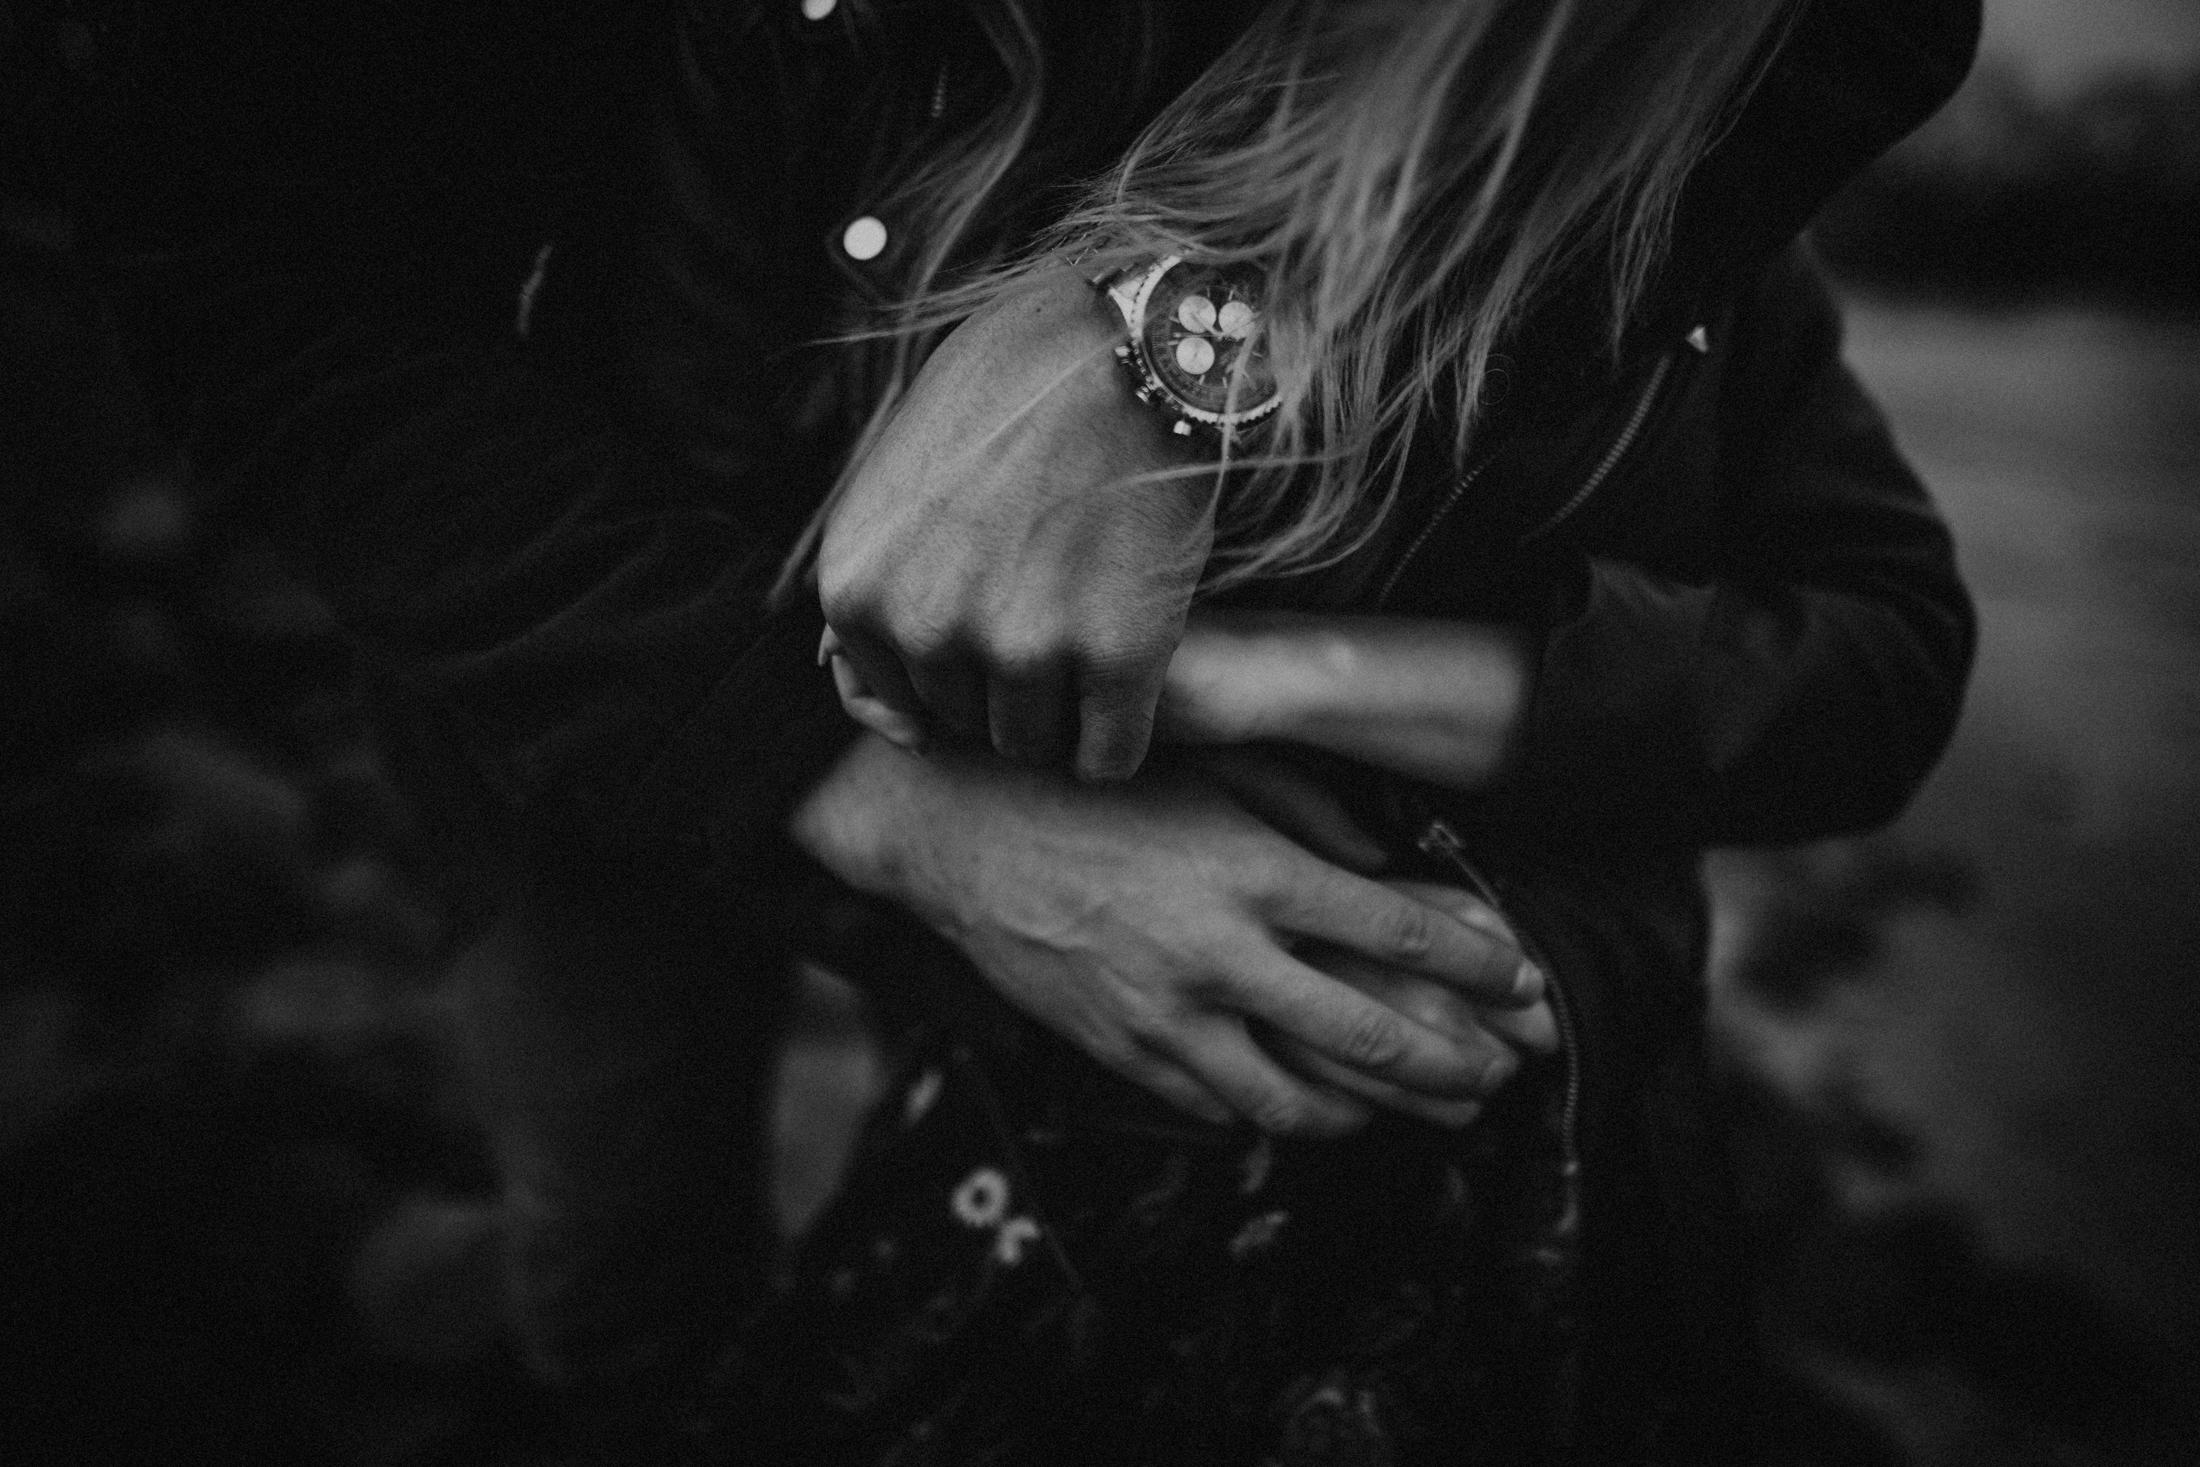 Wedding_Photographer_Mallorca_DanielaMarquardt_Photography_CanaryIslands_Lanzarote_Iceland_Tuscany_Santorini_Portugal_NewYork_Spain_Elopement_Hochzeitsfotograf_CK38